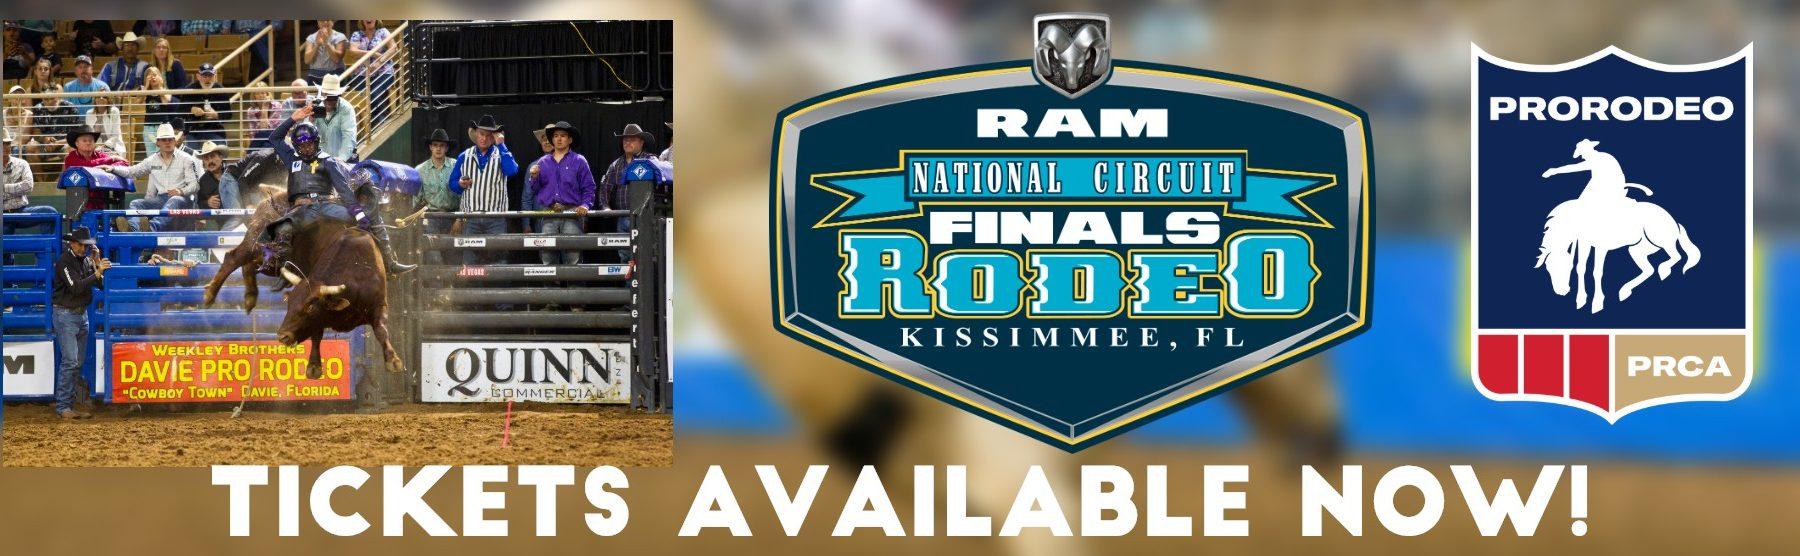 KGS RAM Rodeo Home